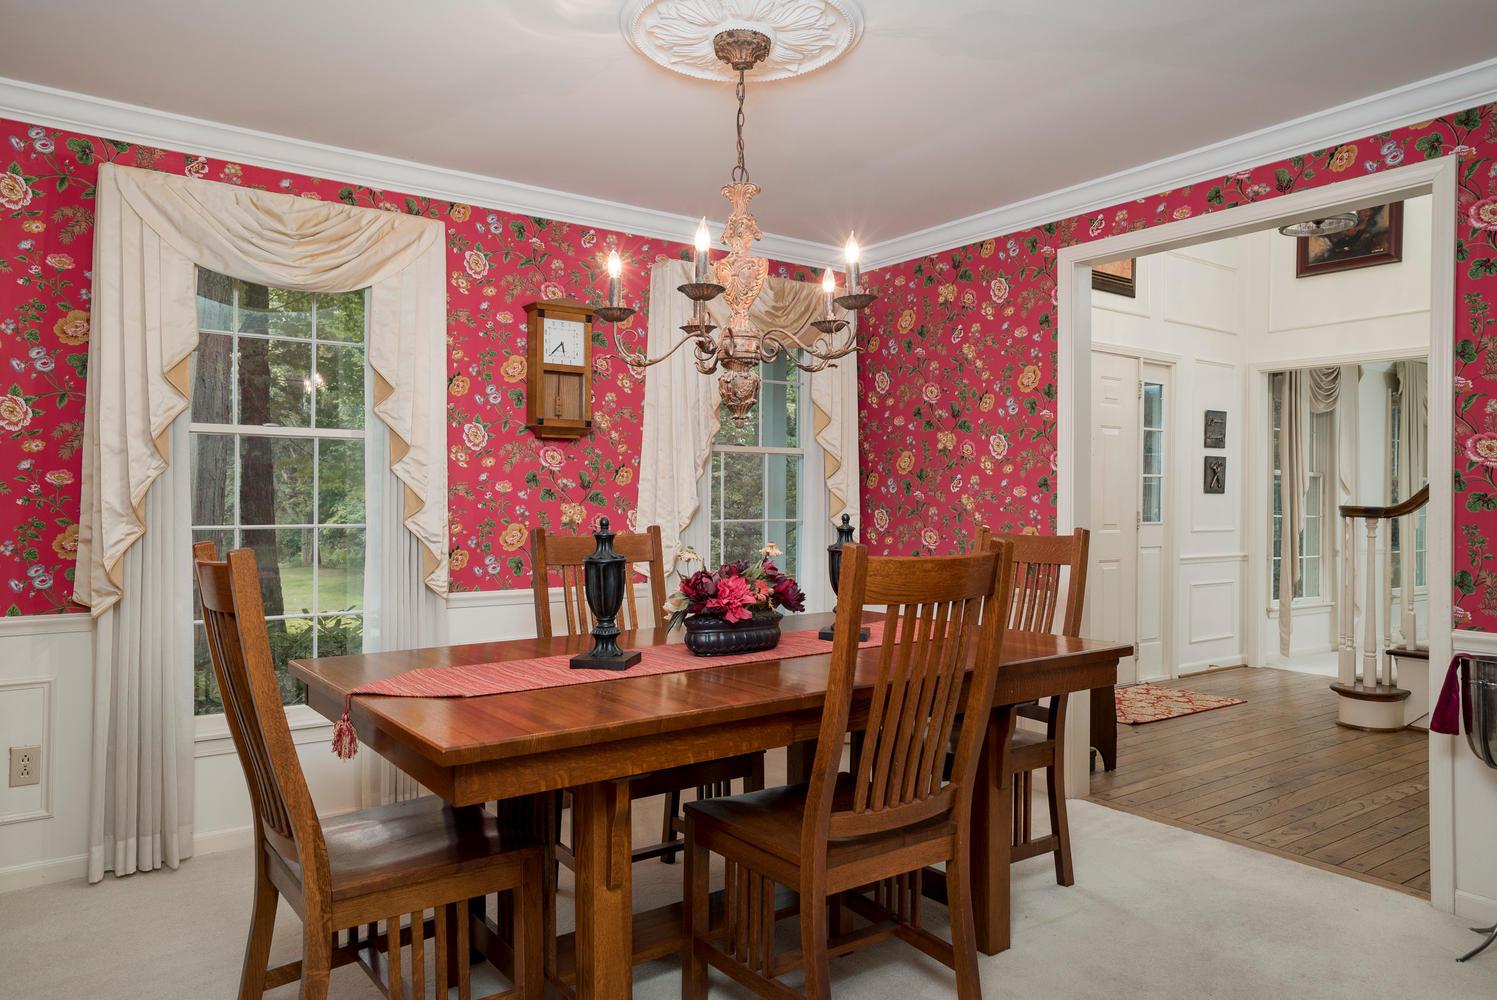 36 Timberlake Dr Orchard Park-large-013-19-Dining Room-1498x1000-72dpi